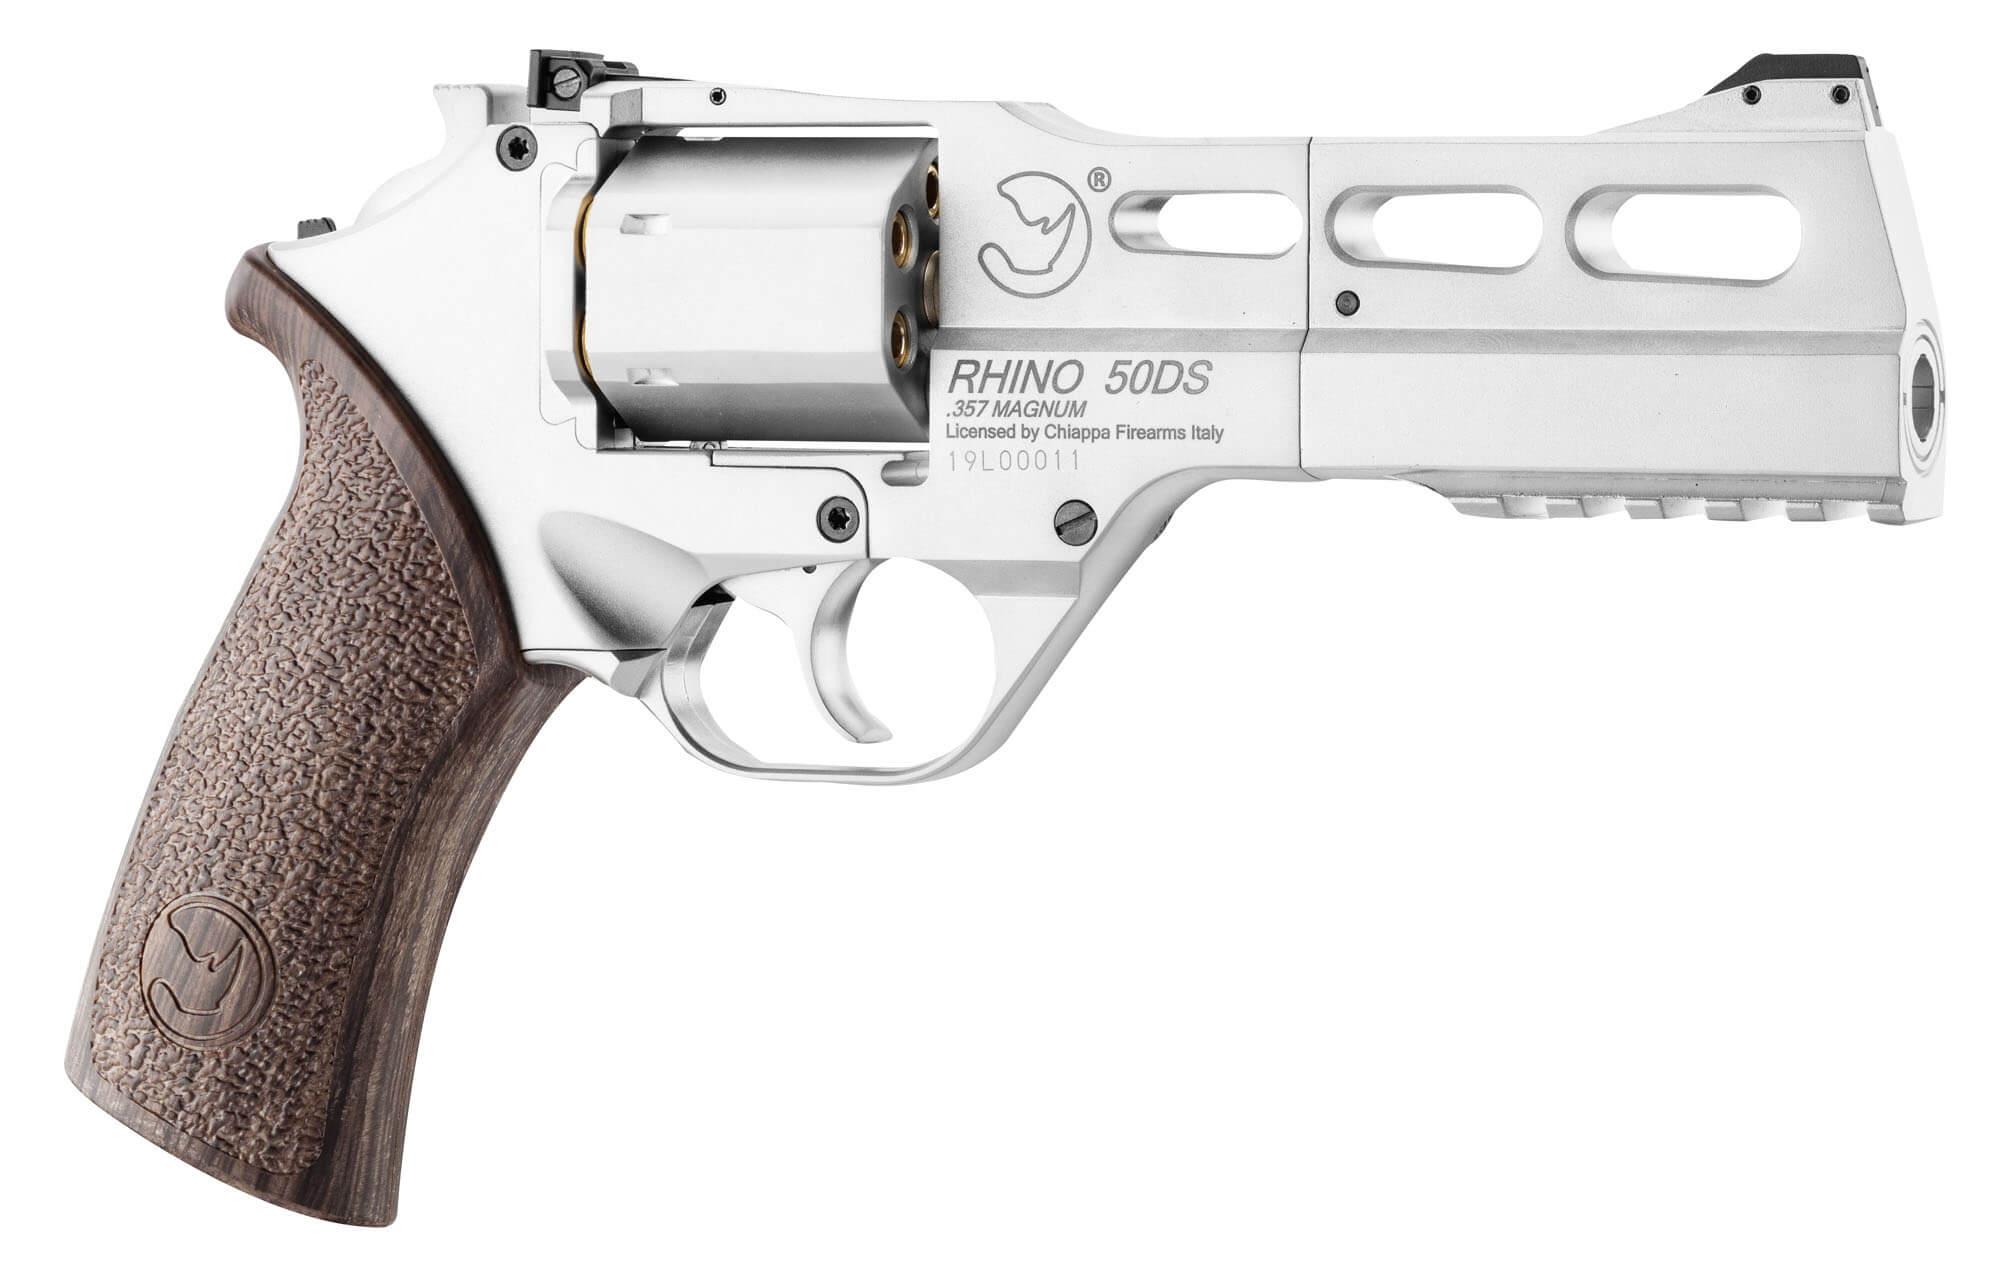 Billede af Chiappa Rhino 50DS, Sølv